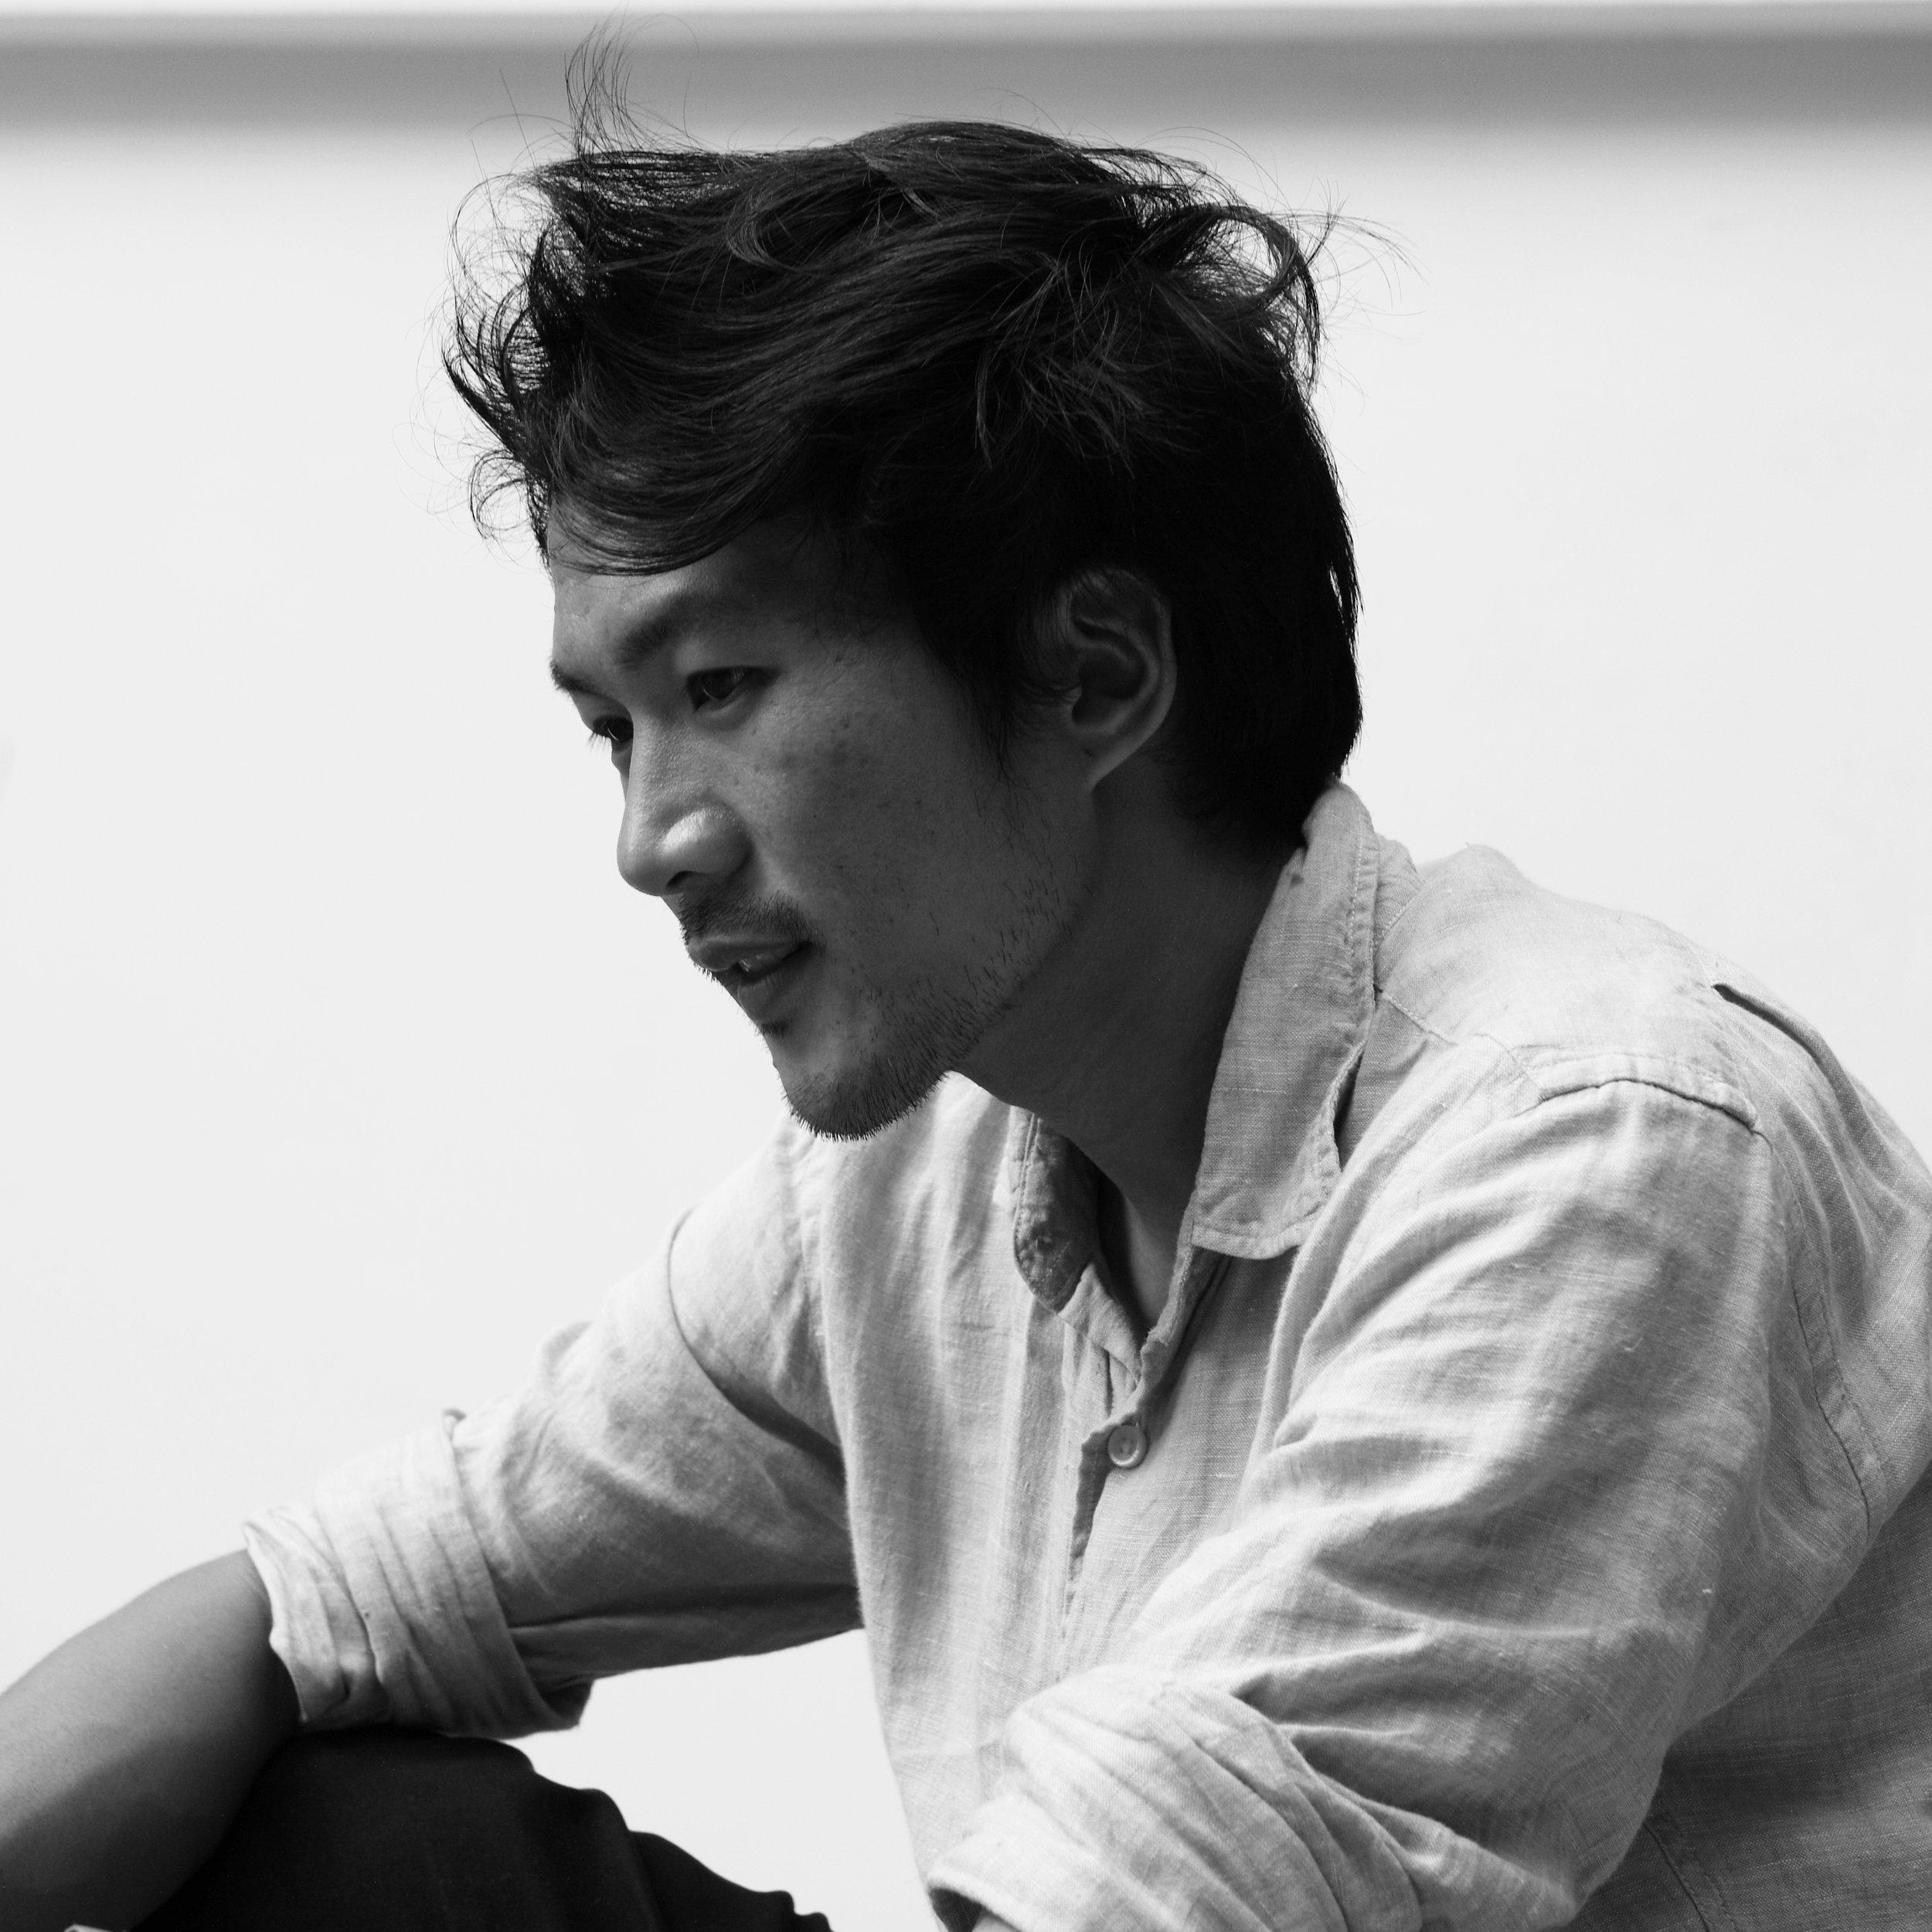 tung_profile picture.JPG